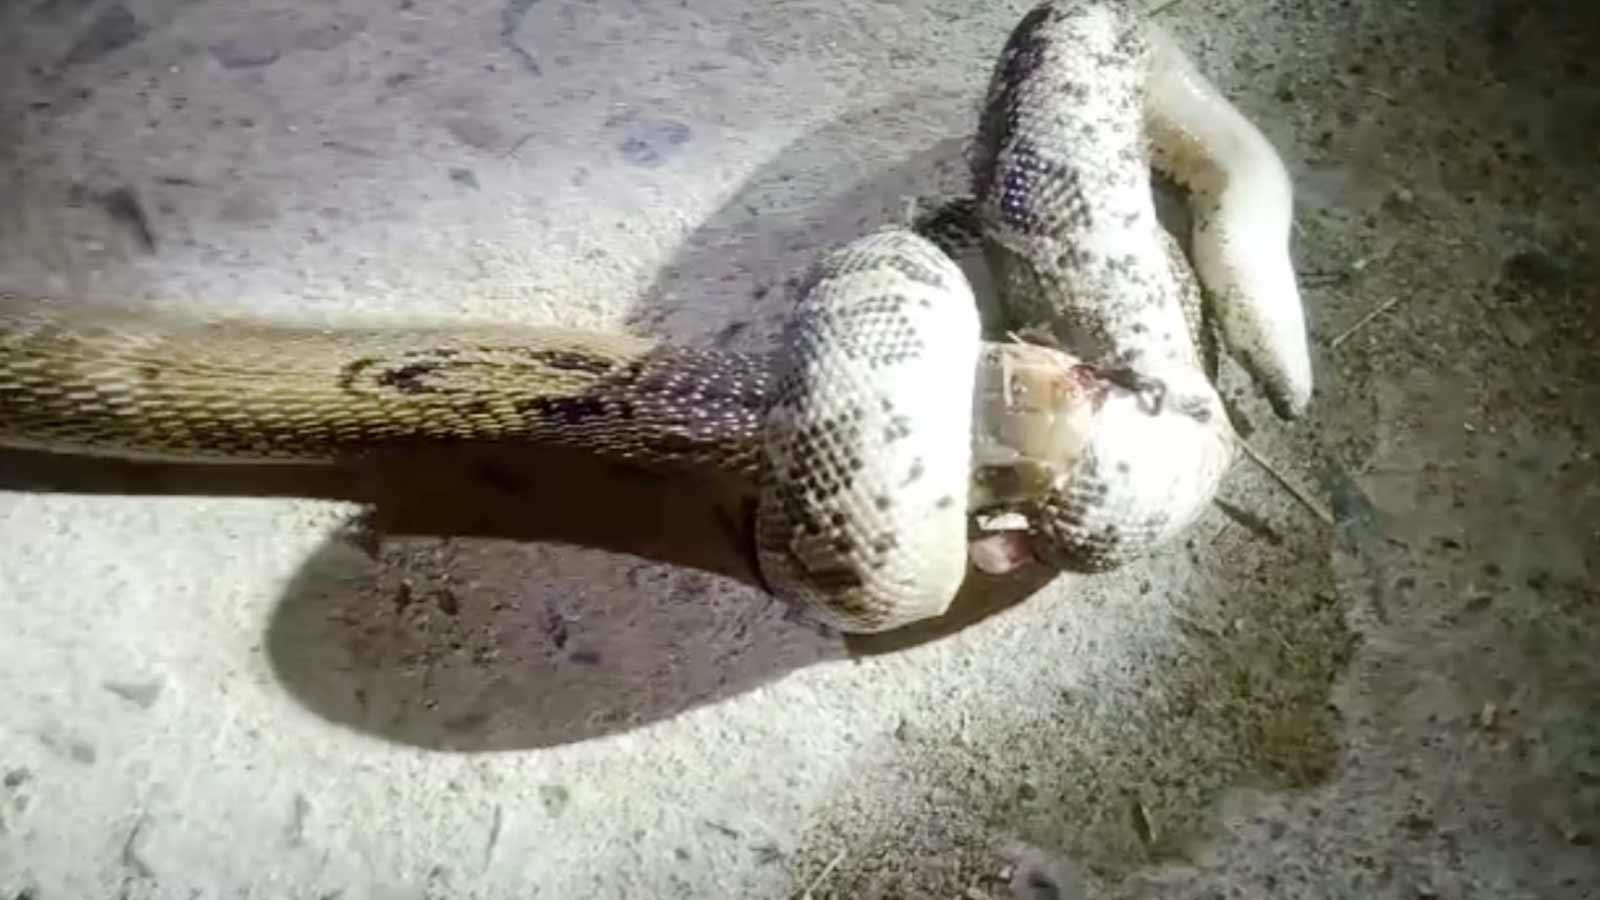 watch-fierce-fight-between-1-ft-long-sand-boa-and-4-ft-long-cobra